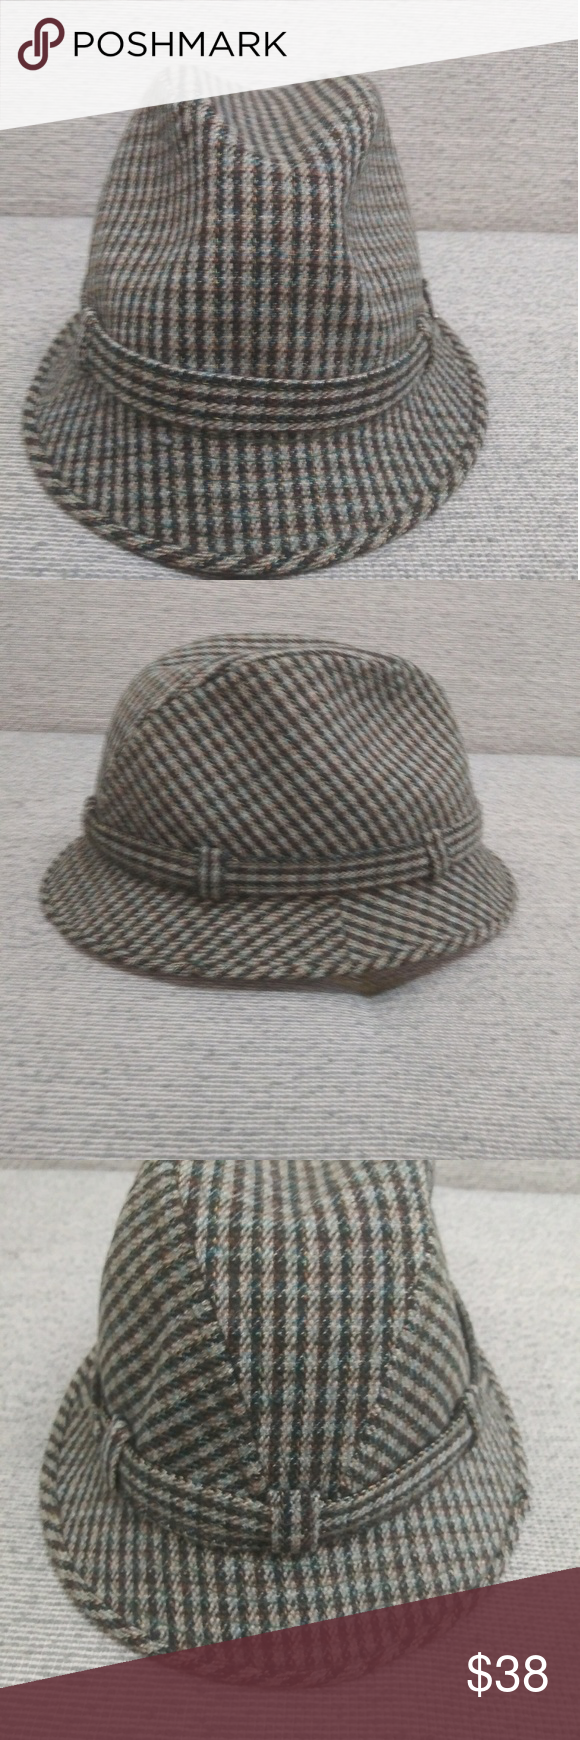 Vintage Edinburgh Woolen Mill Mens Hat Hats For Men Woolen Hats